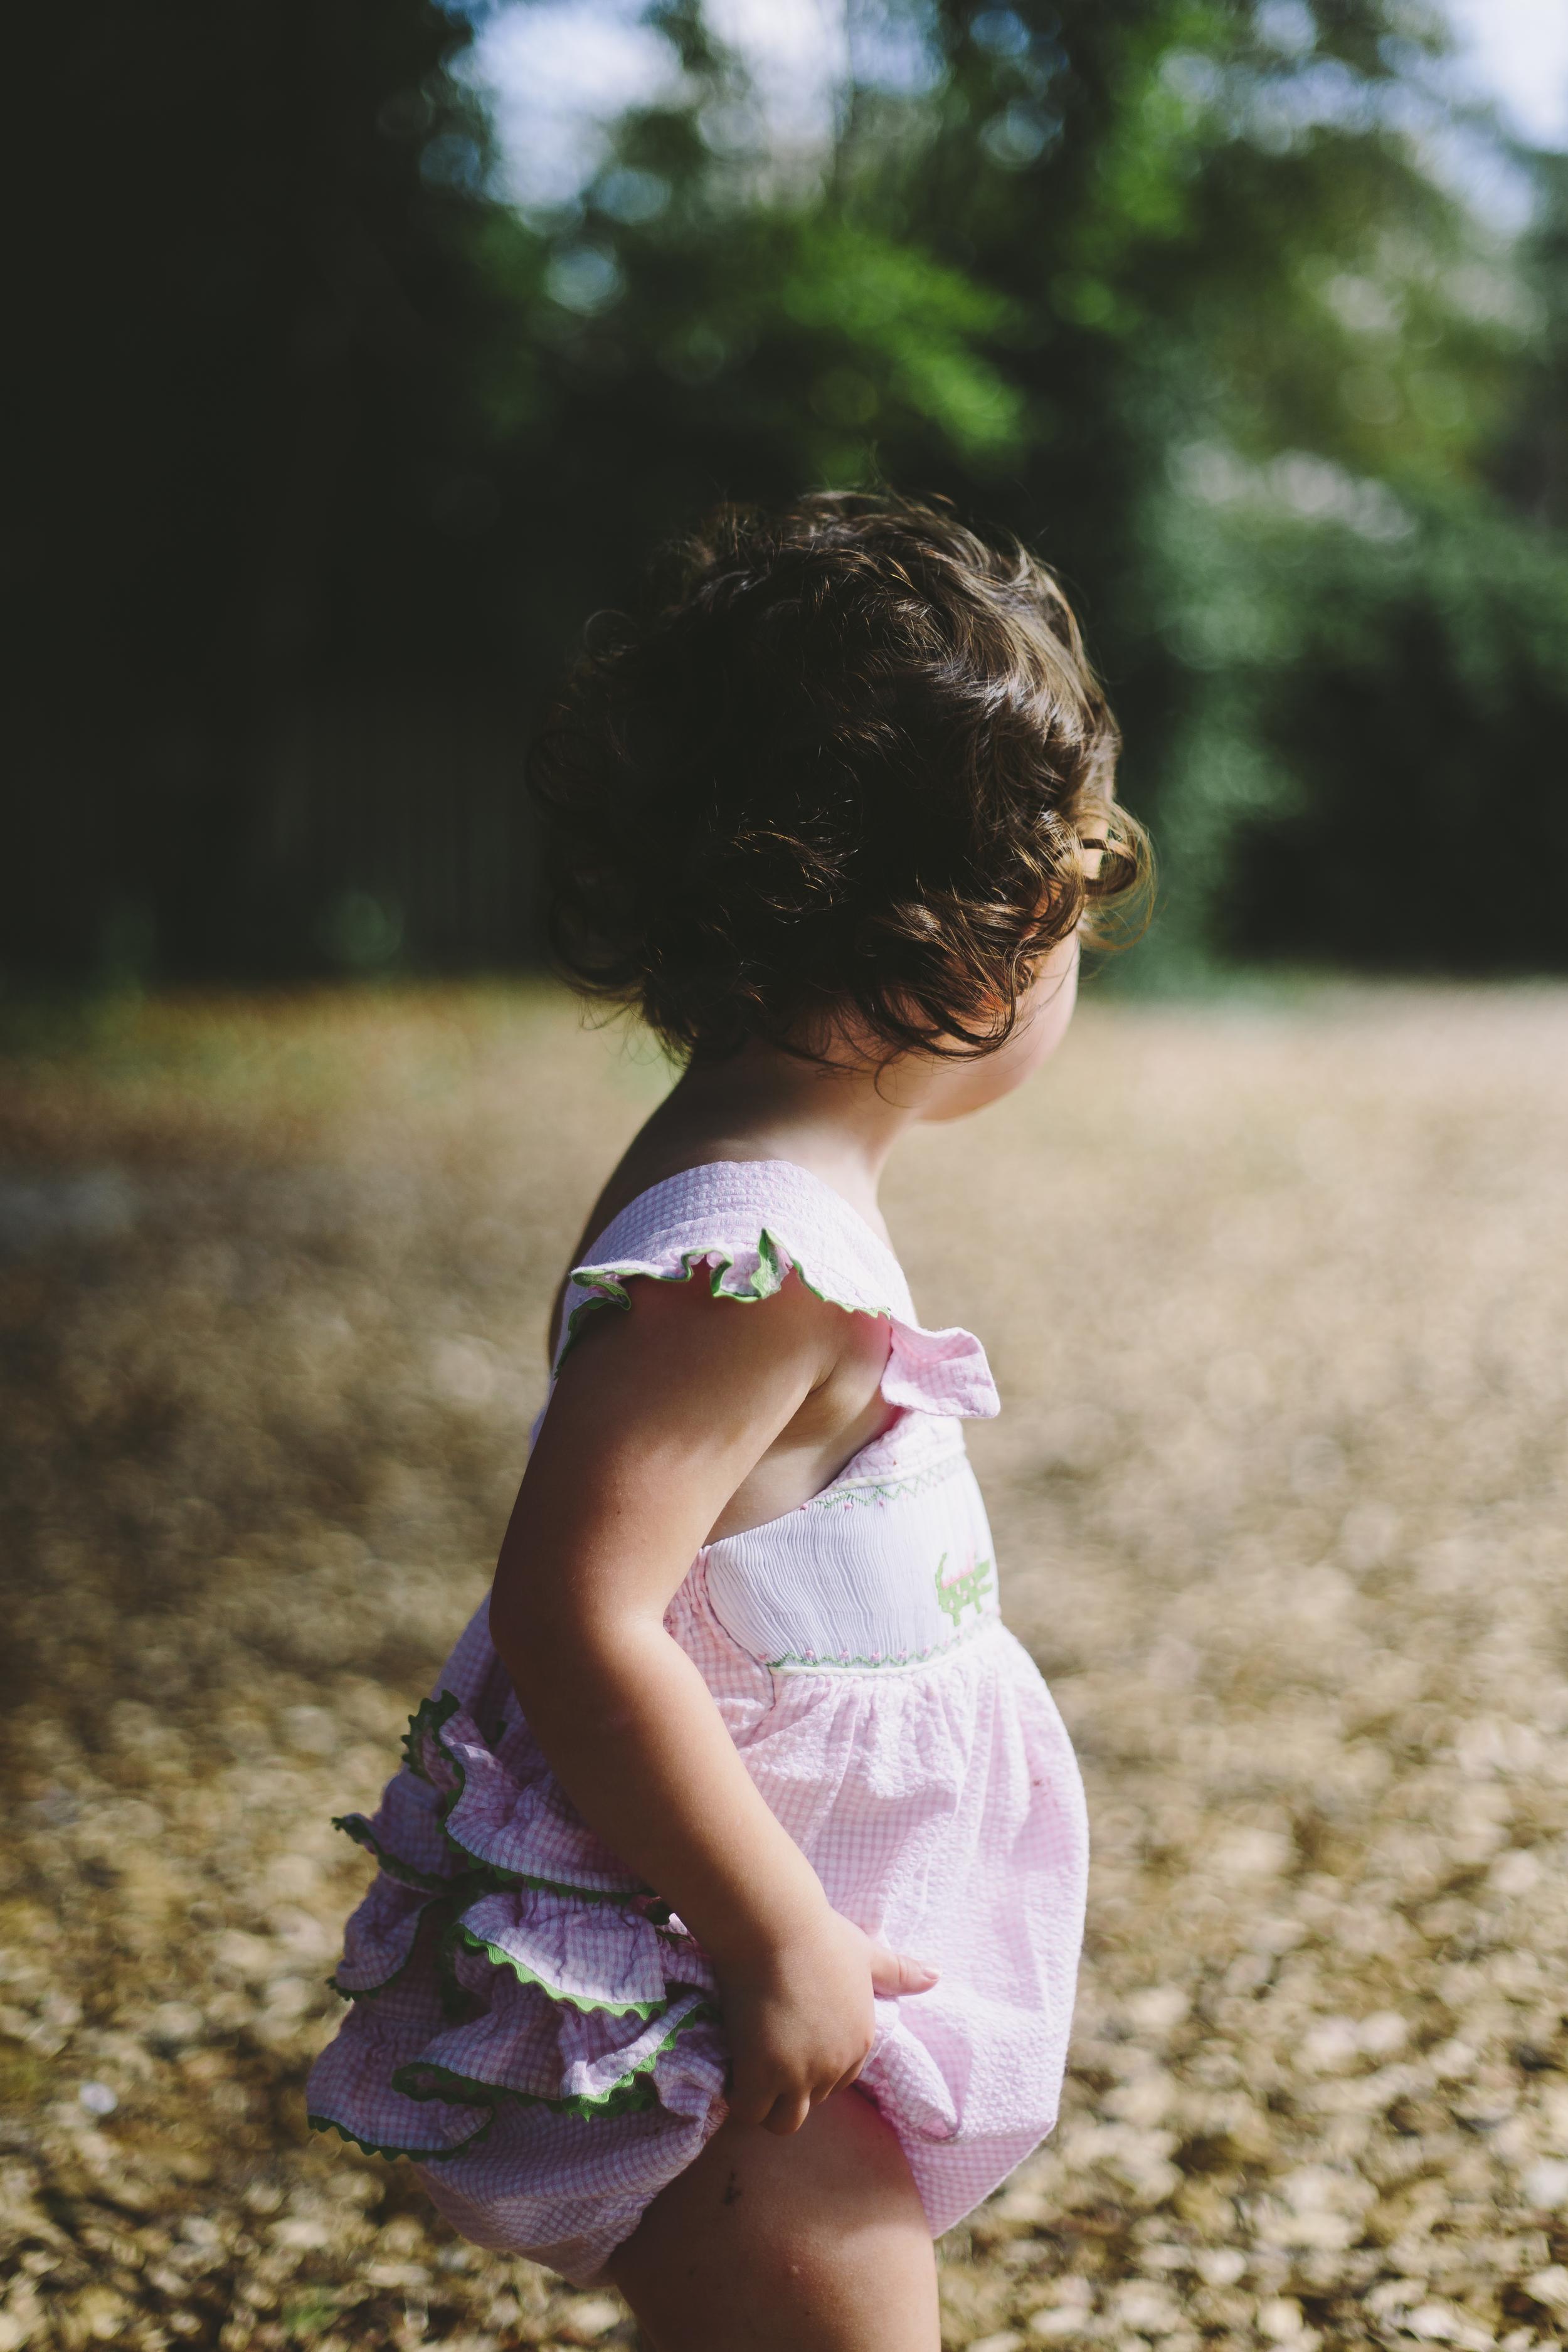 evie's curls at the park summer 2015.jpg